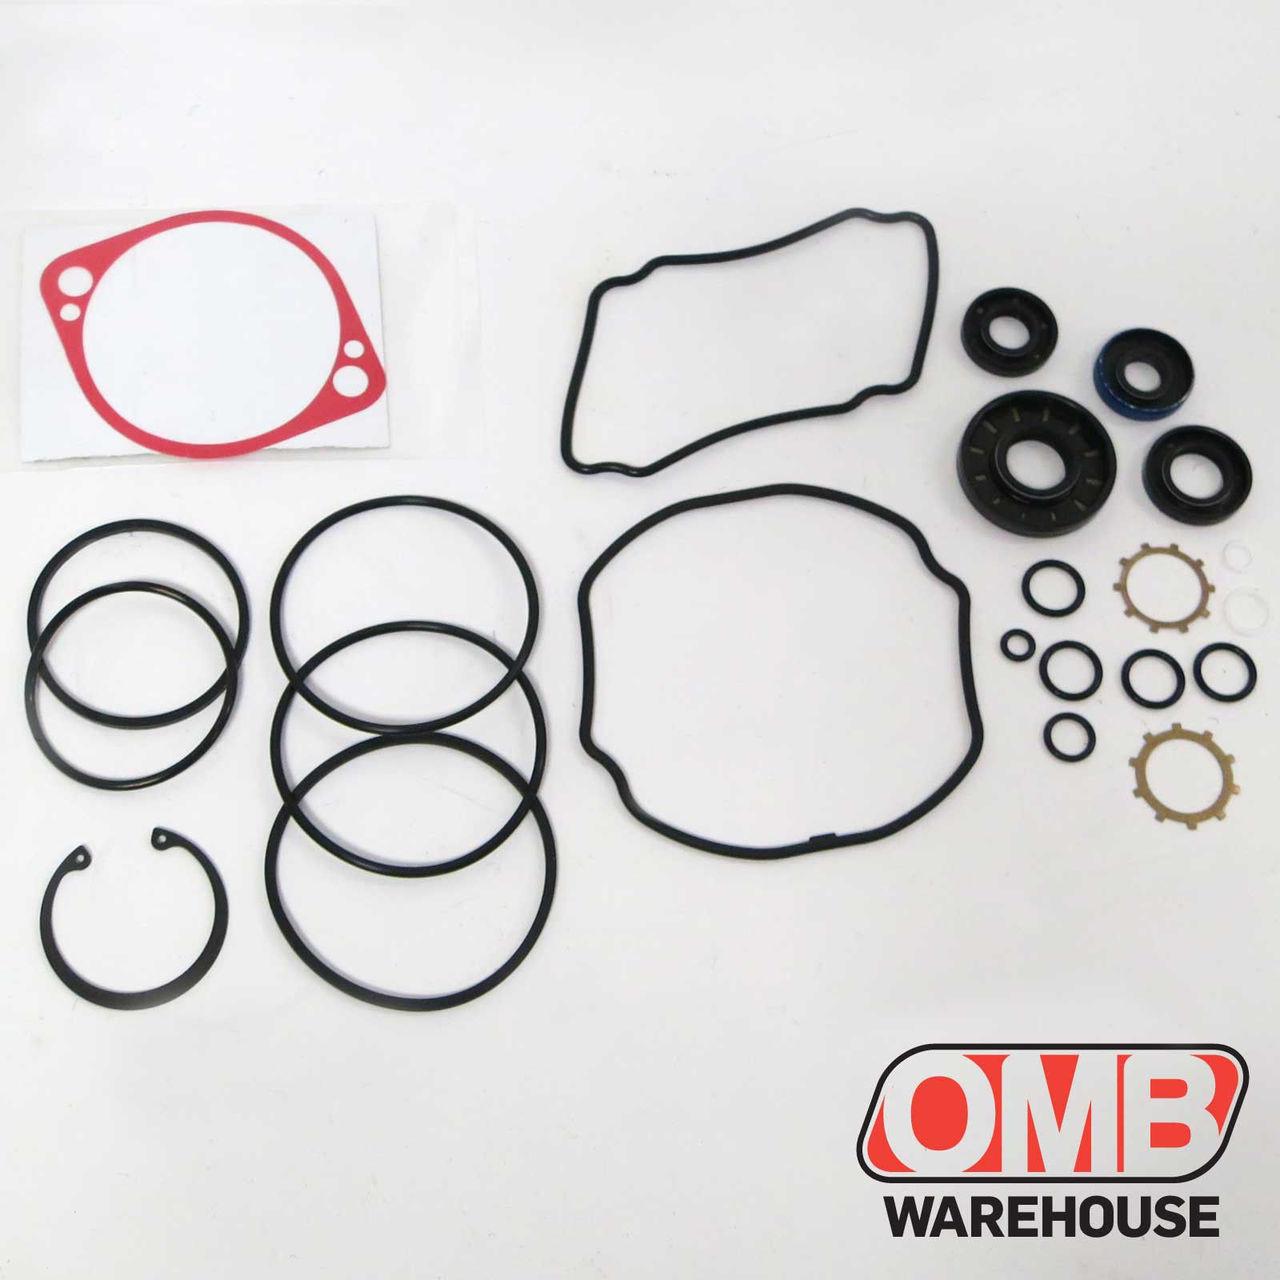 (2) Hydro Gear 70525 OEM BDP-10A Overhaul Gasket Seal Kit Fits Husqvarna